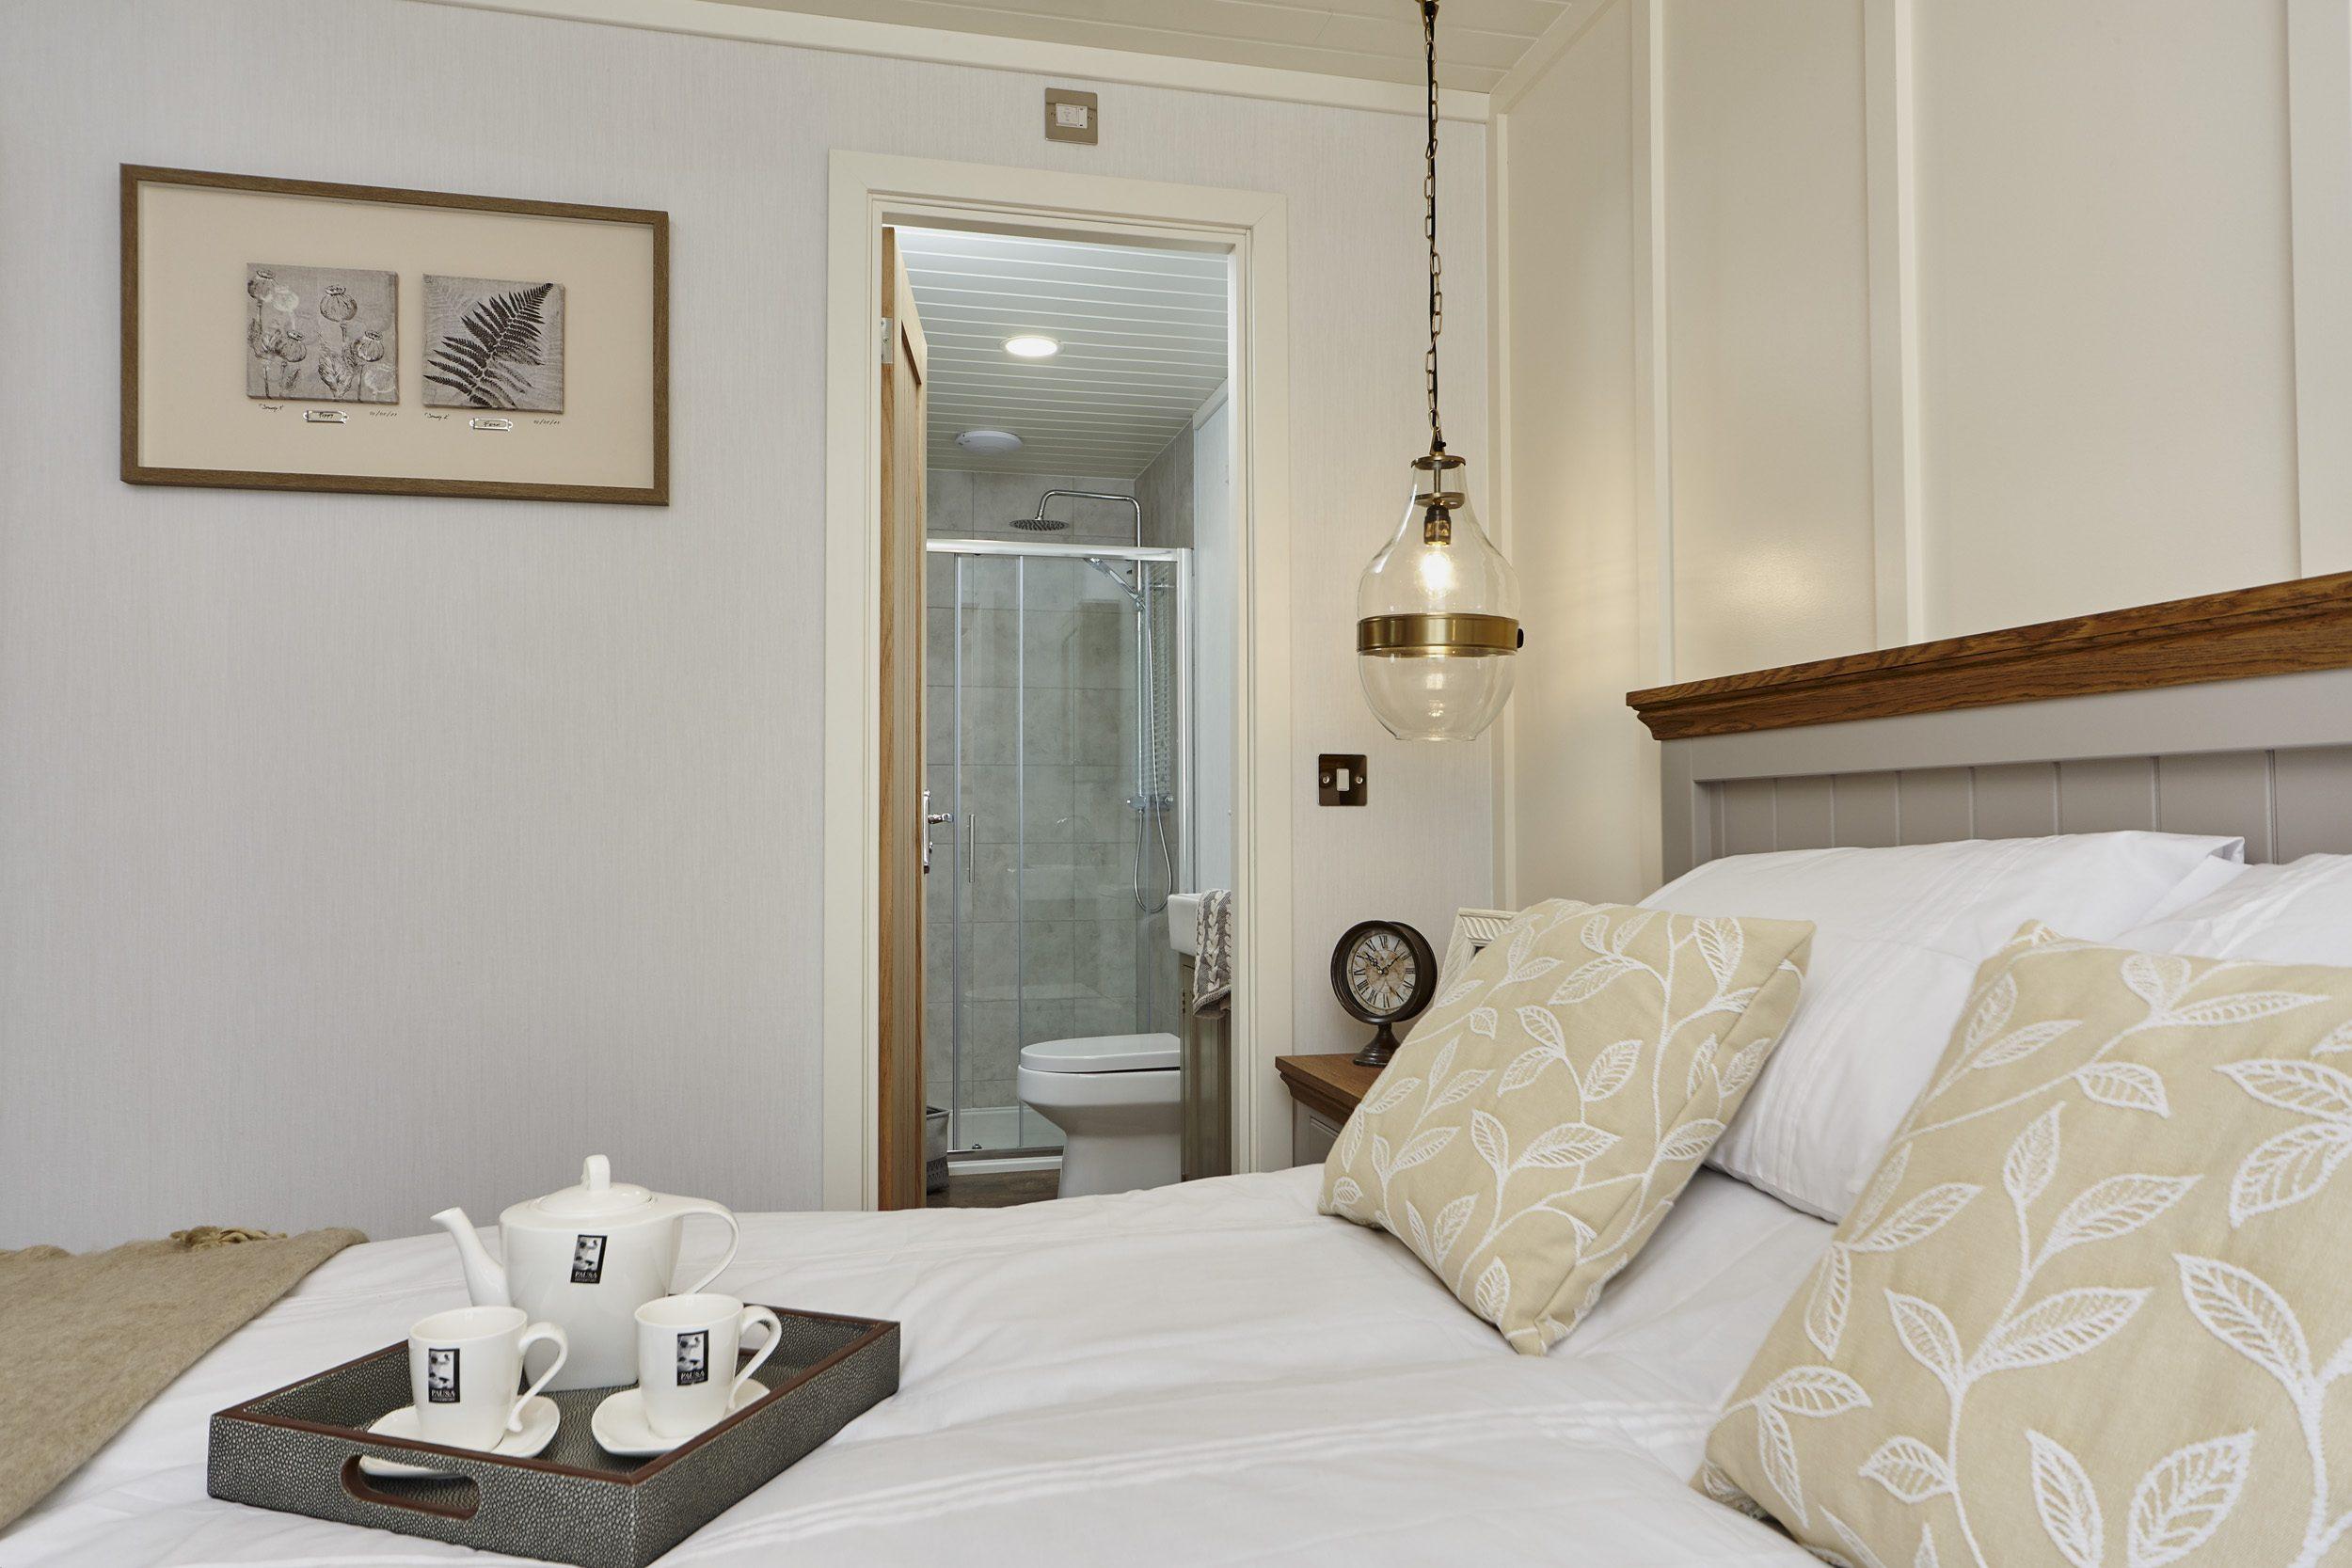 The Muskoka lodge, bedroom view - double room looking into bathroom